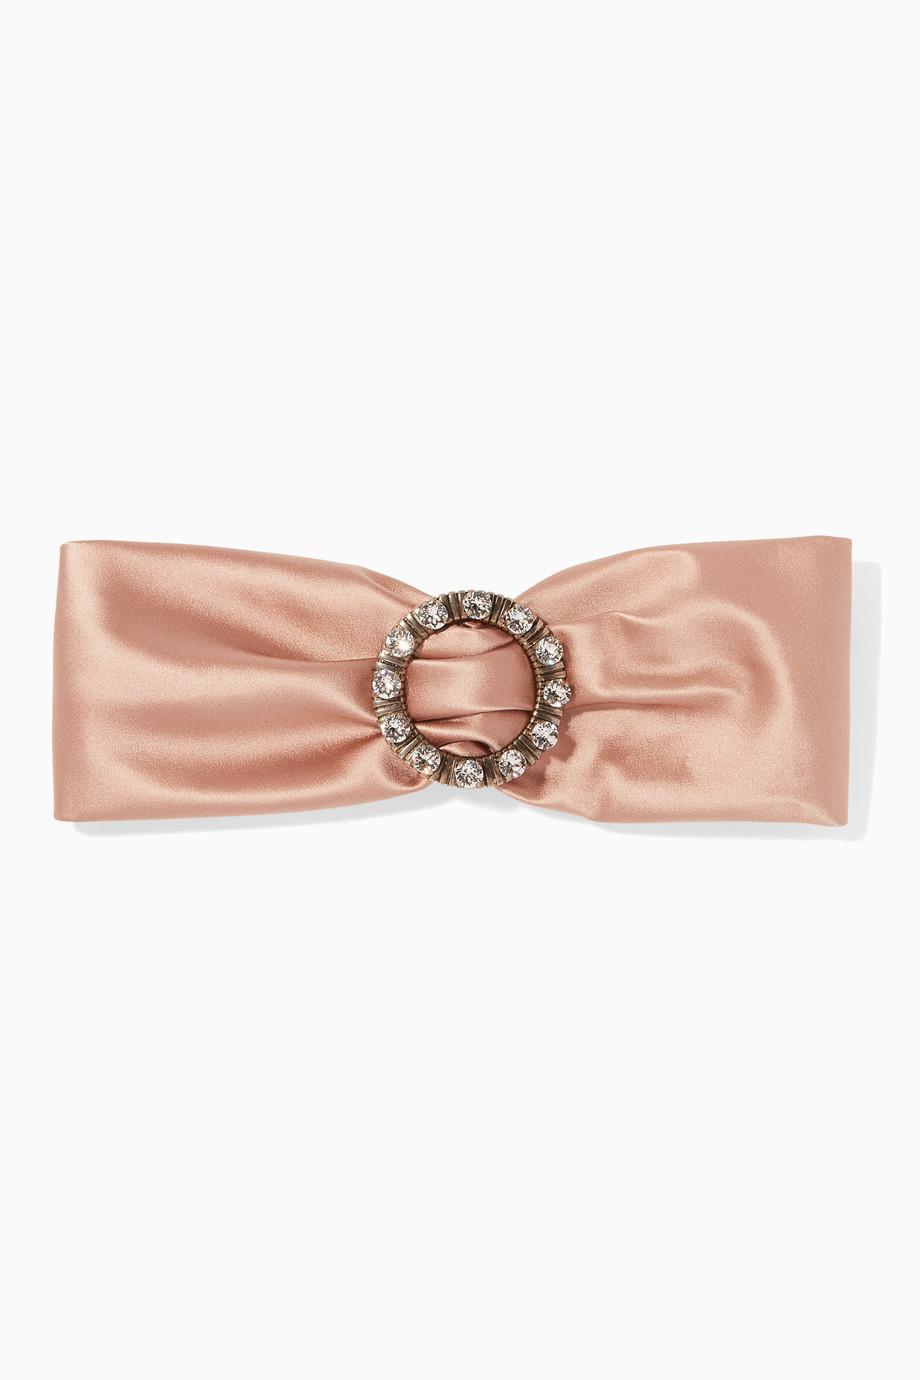 67c411b26037 Shop Miu Miu Neutral Blush Crystal-Brooch Silk Headband for Women ...